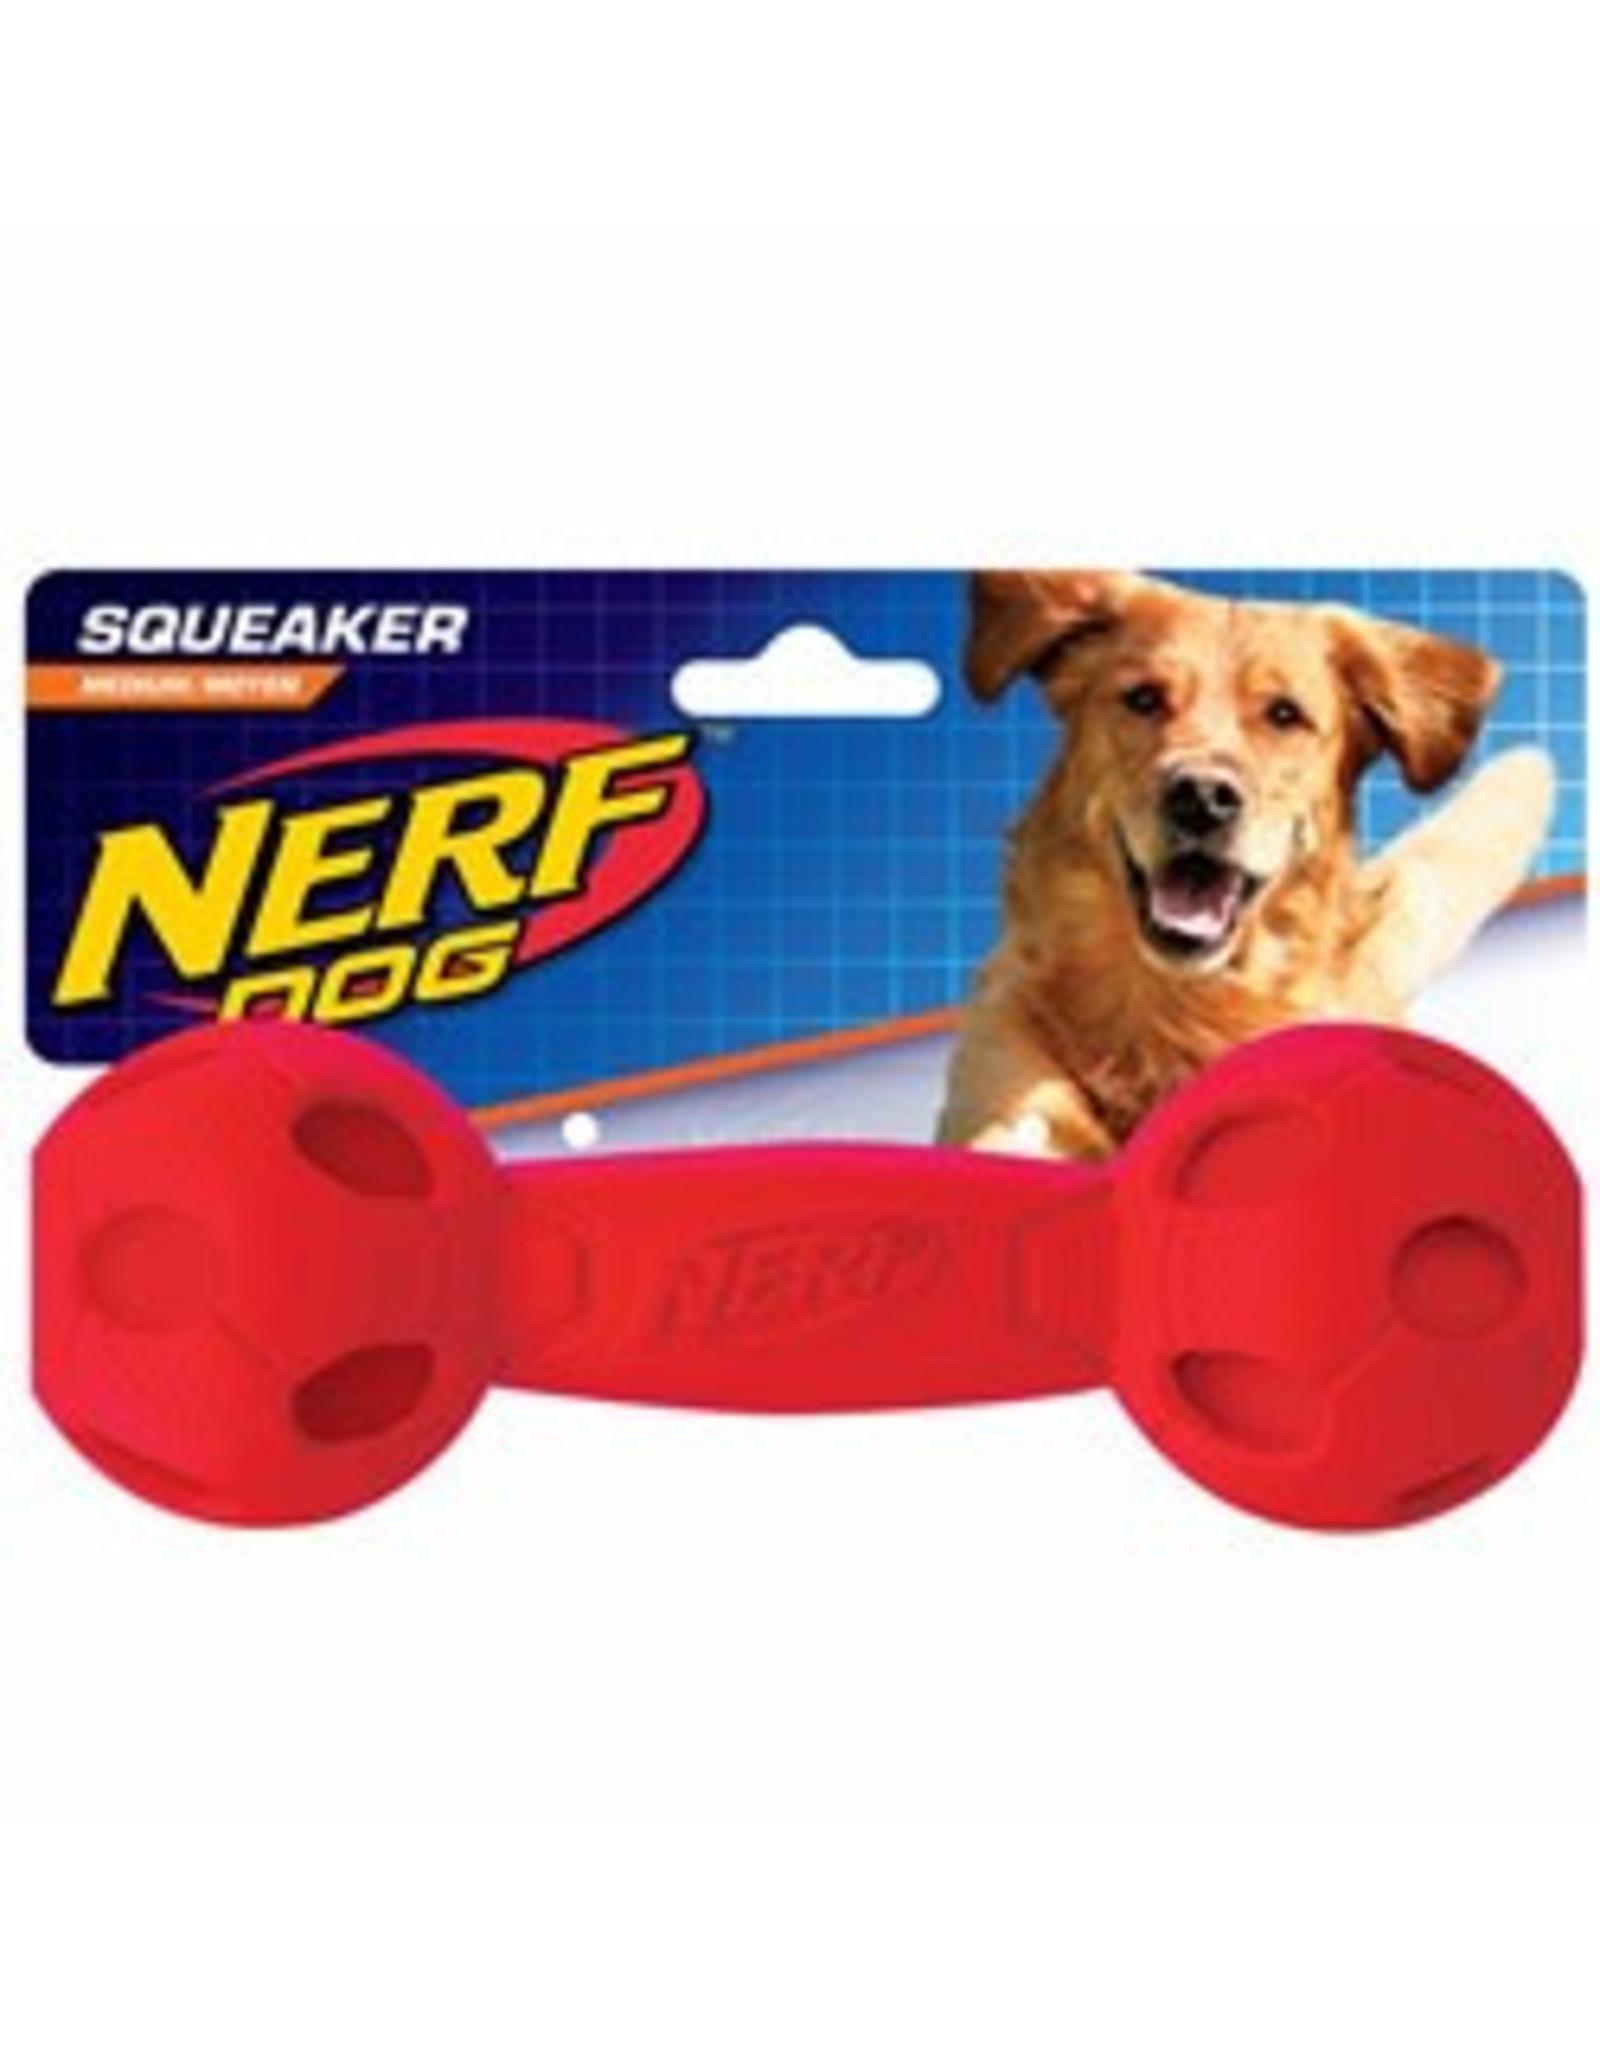 Nerf Squeak Barbell Dog Toy, Medium, 19cm